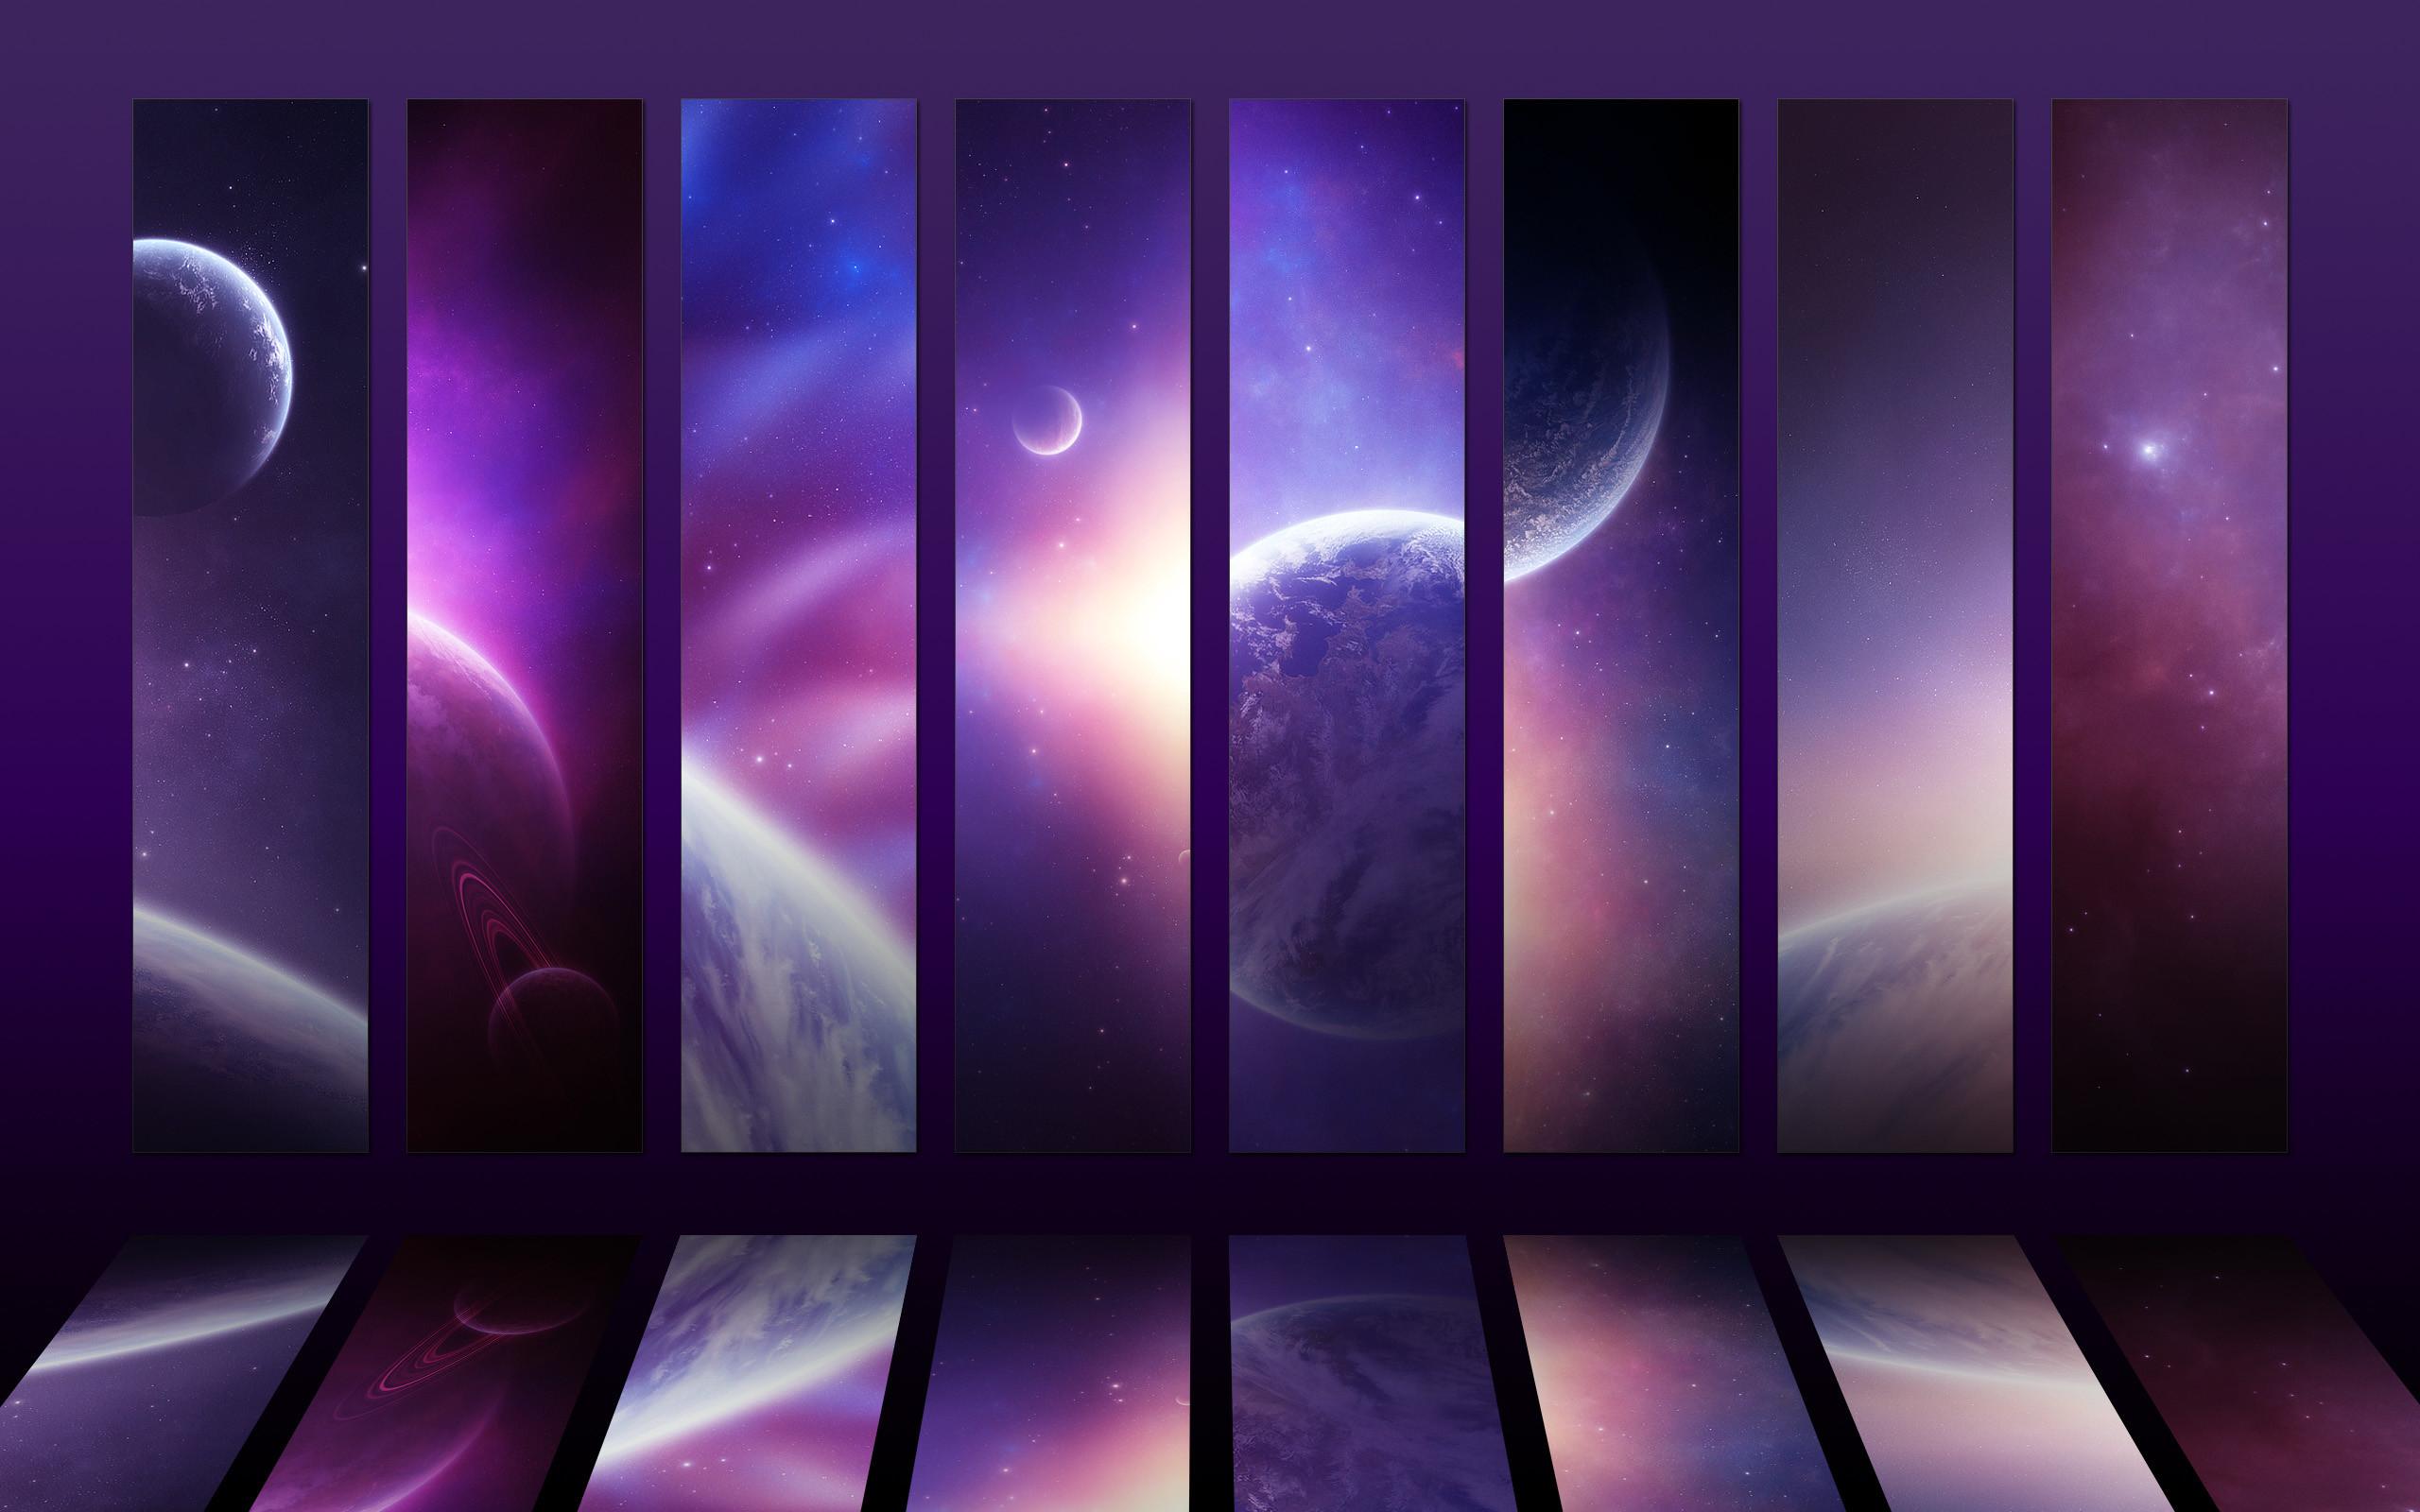 Purple Wallpapers 12 Best Wallpapers Collection Desktop: Purple HD Wallpaper (76+ Images